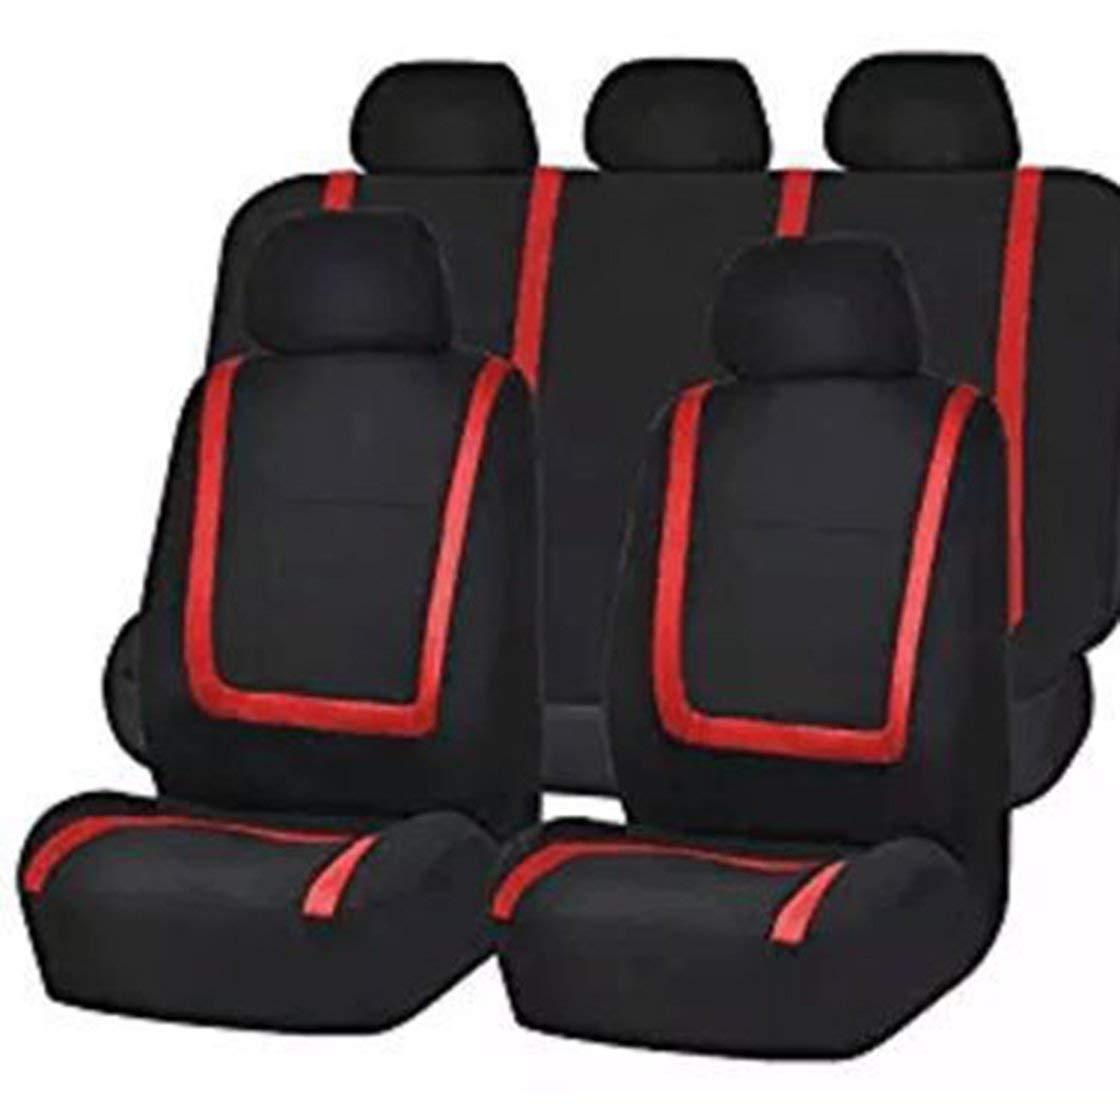 Hermosairis 9 Teile/Satz Mode Gestreiften Autositzbezü ge Staubdicht Waschbar Sitzschutz Universal Sitzbezü ge fü r Auto Autos